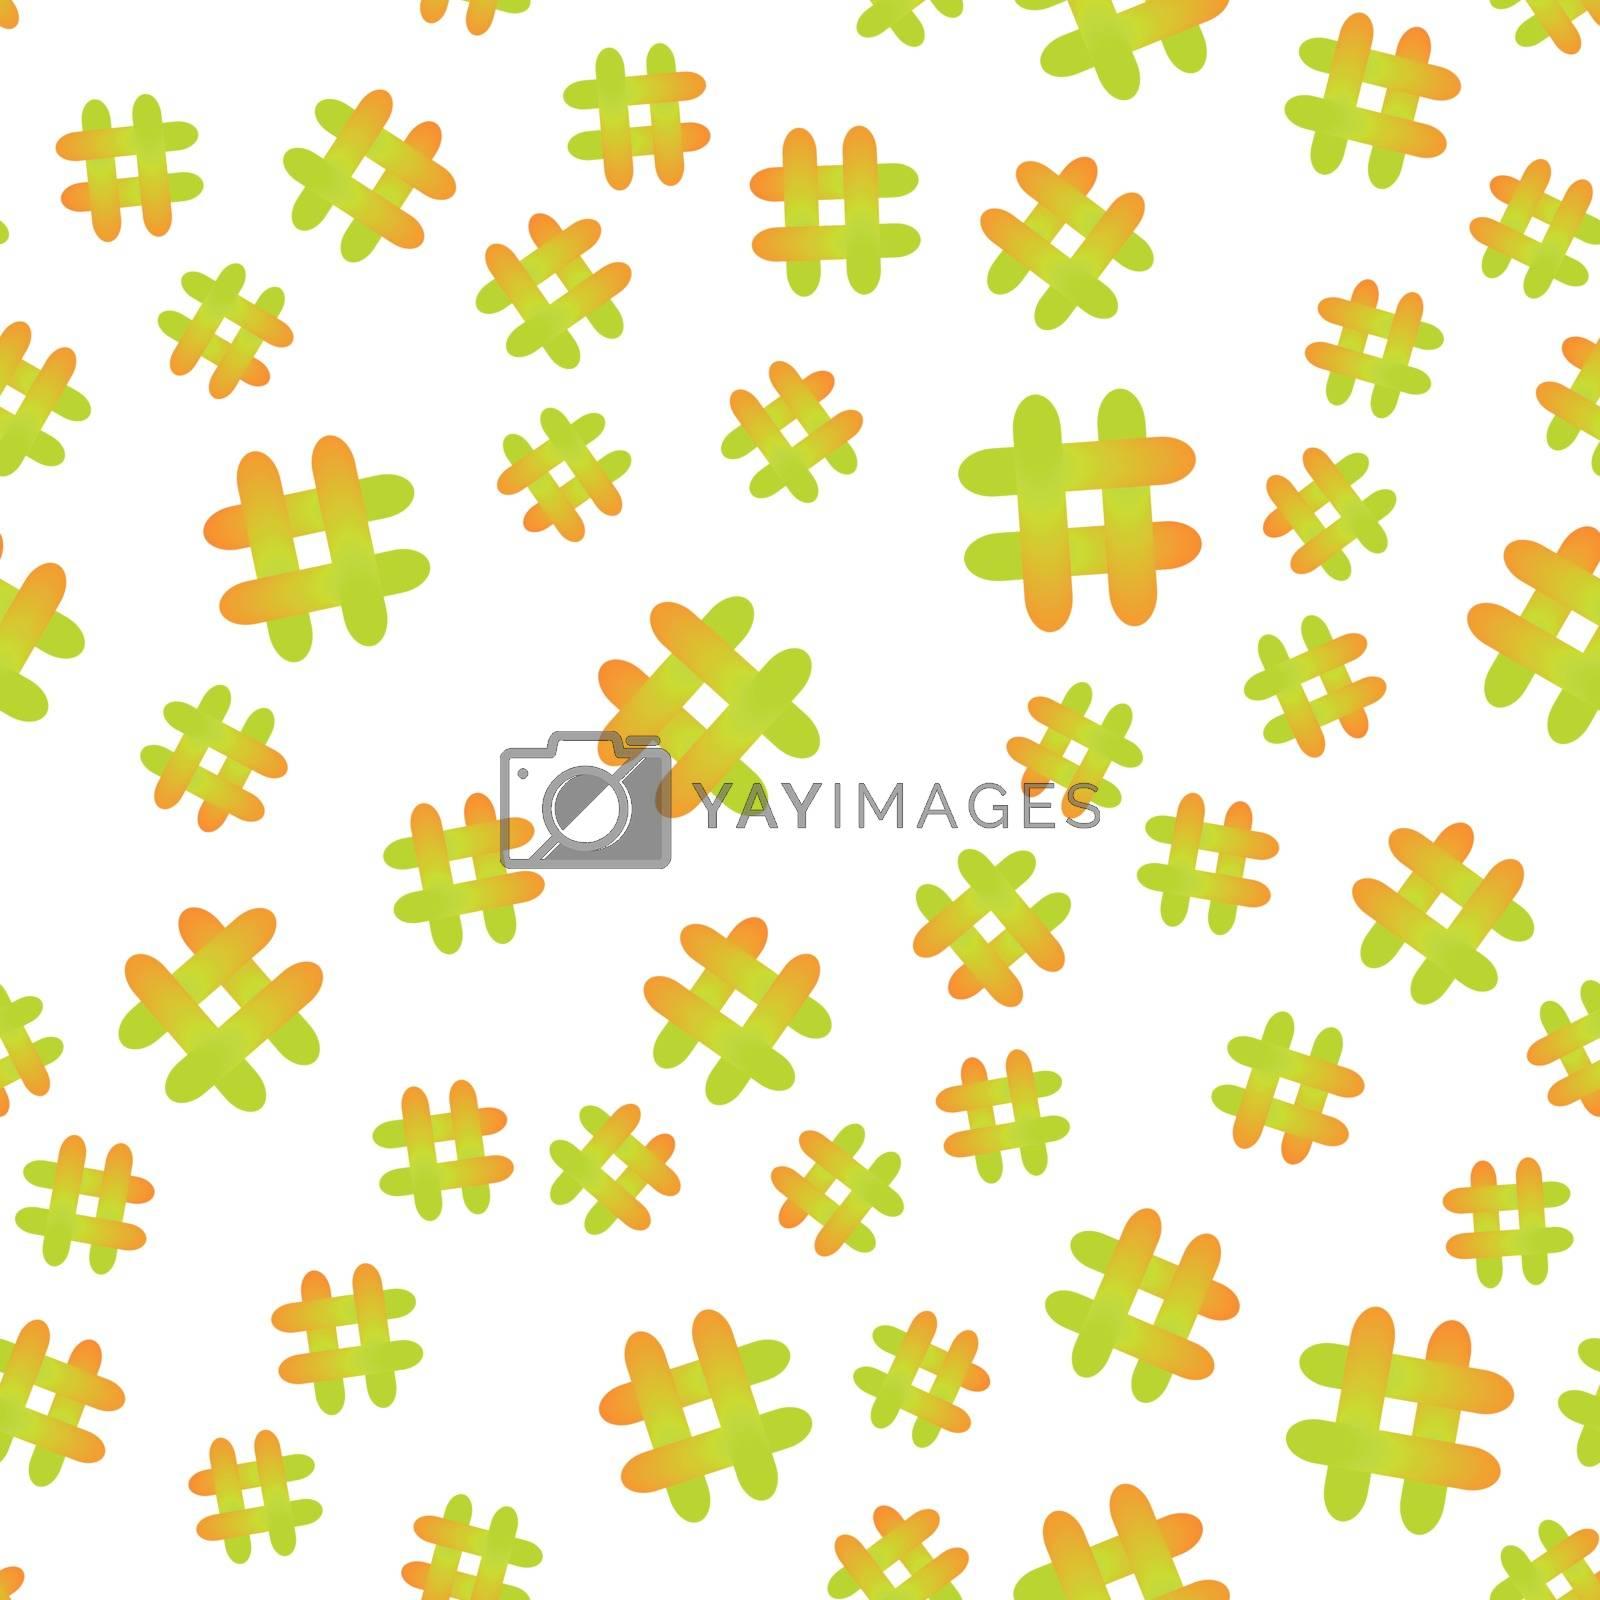 Vector illustration. Hashtag icon seamless pattern. Hashtag random seamless pattern